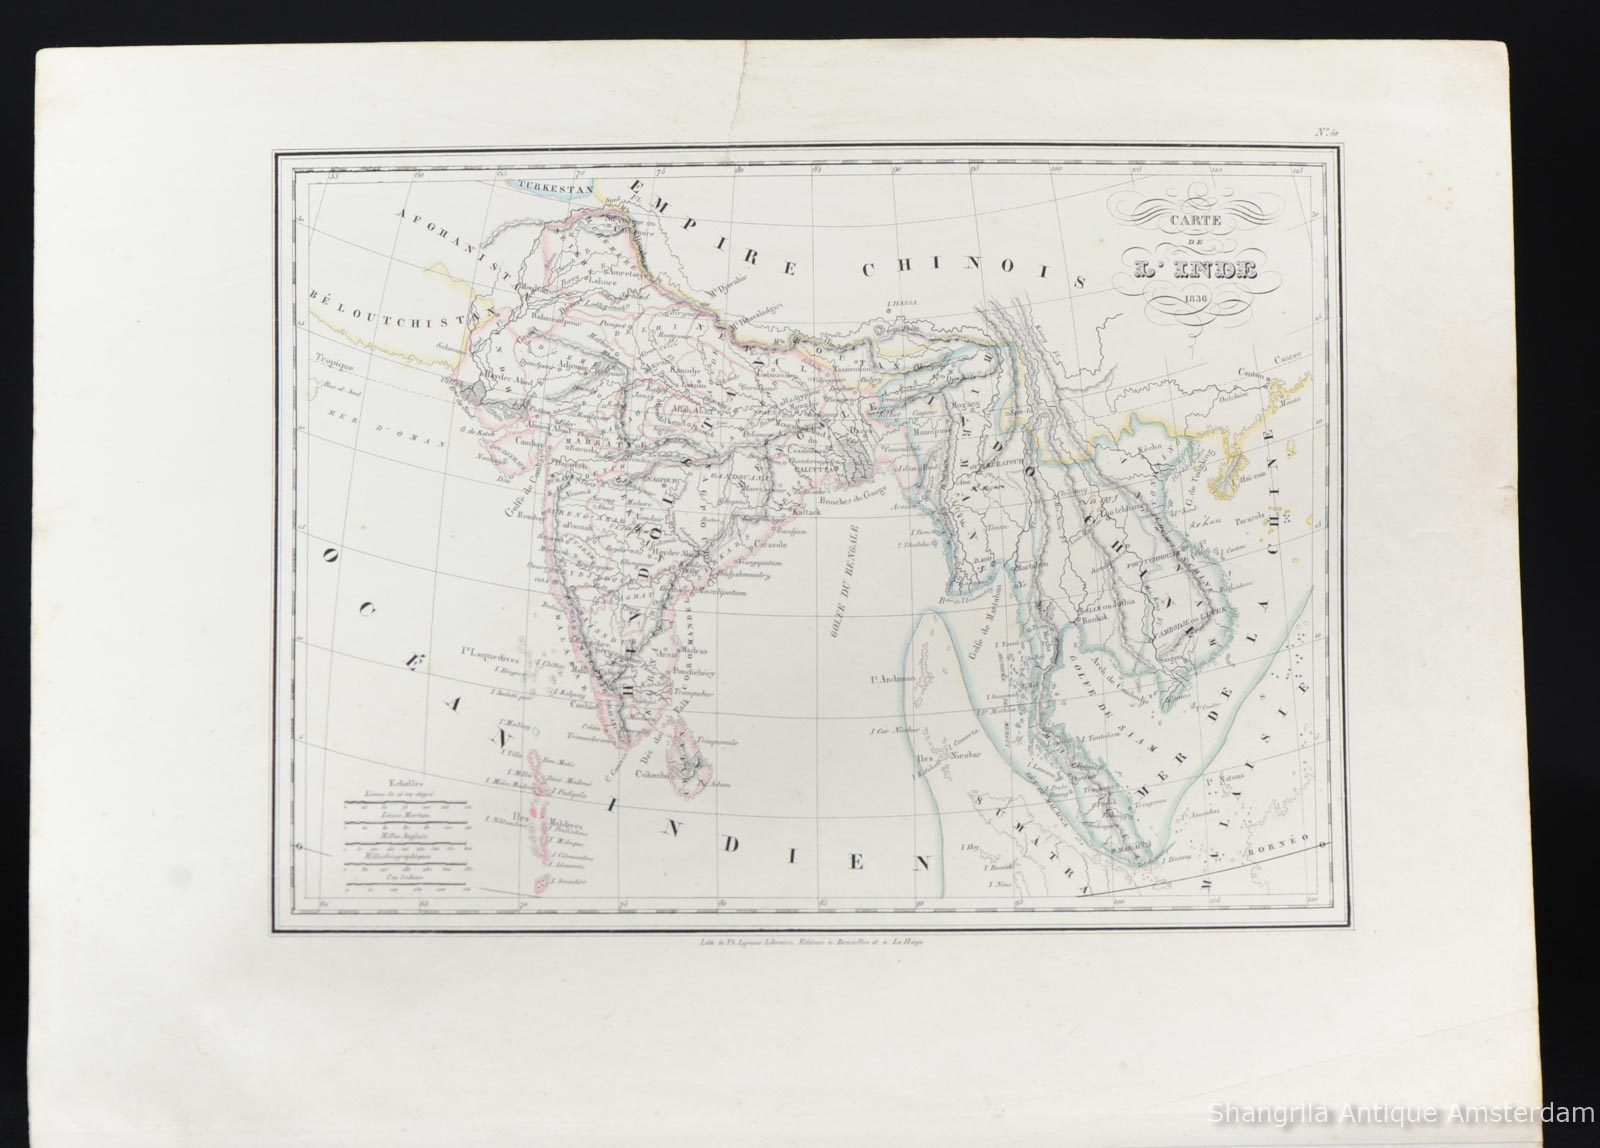 Carte De Linde En 1900.Antique 1836 Carte De L Inde Myanmar Malaysia Vietnam Map